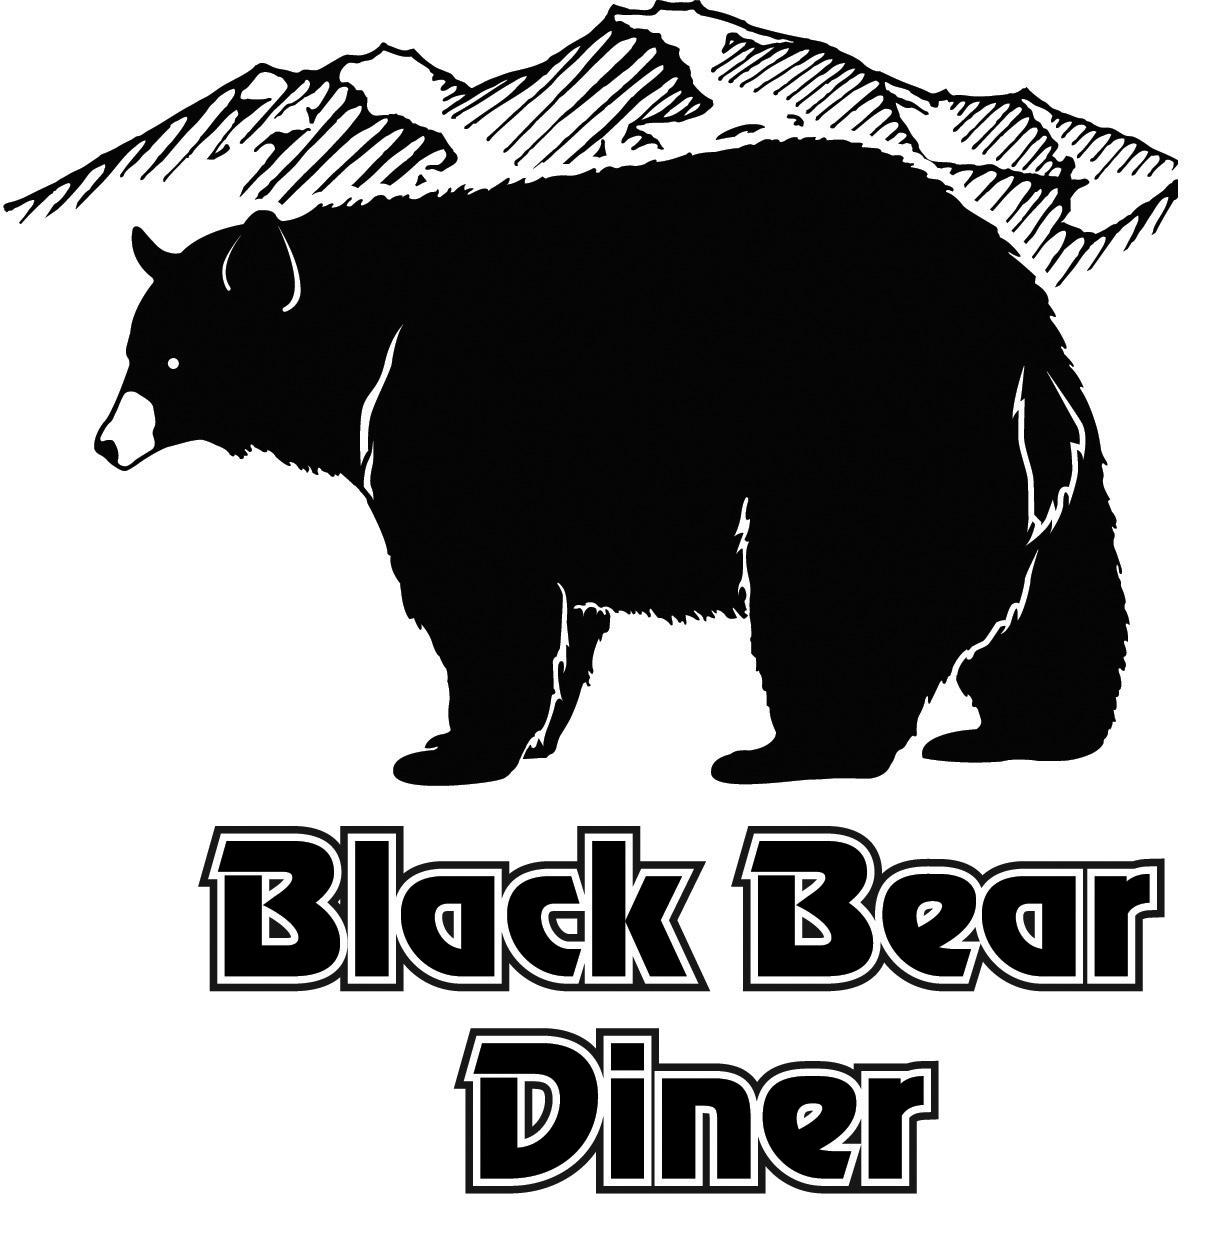 Black Bear Diner Announces Hiring Of Teresa Donich As Vice